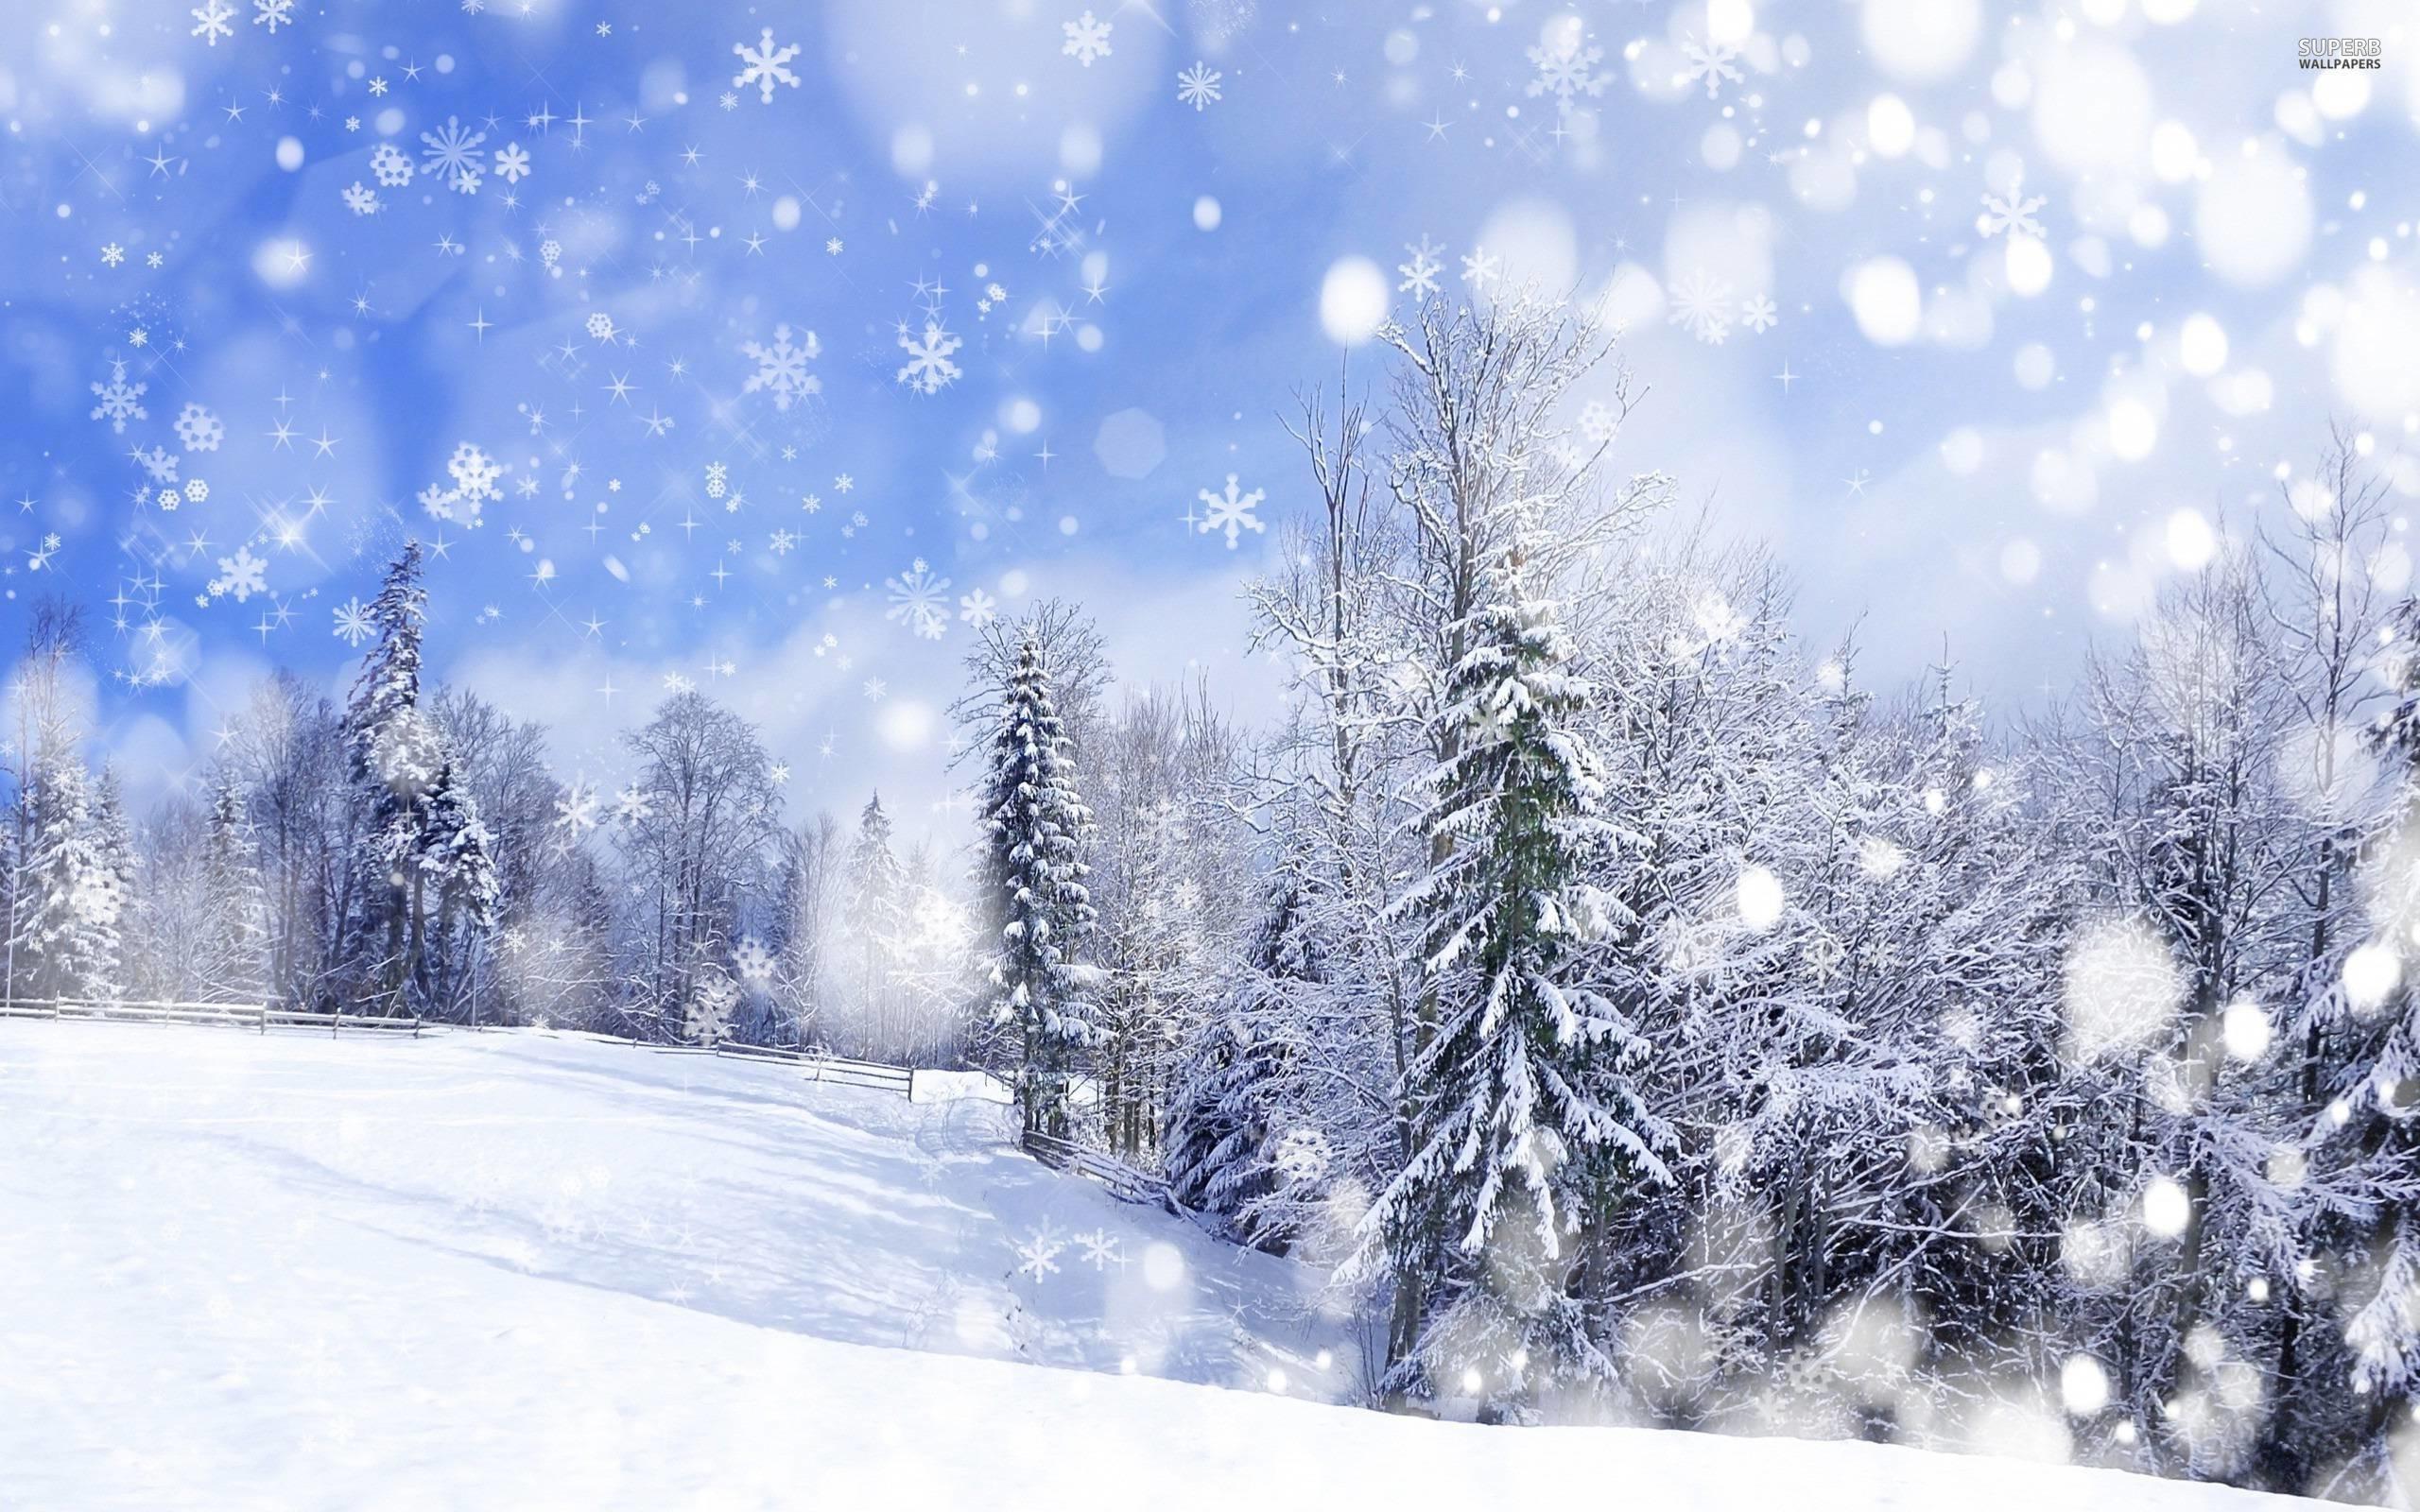 Snowfall, Snowfall